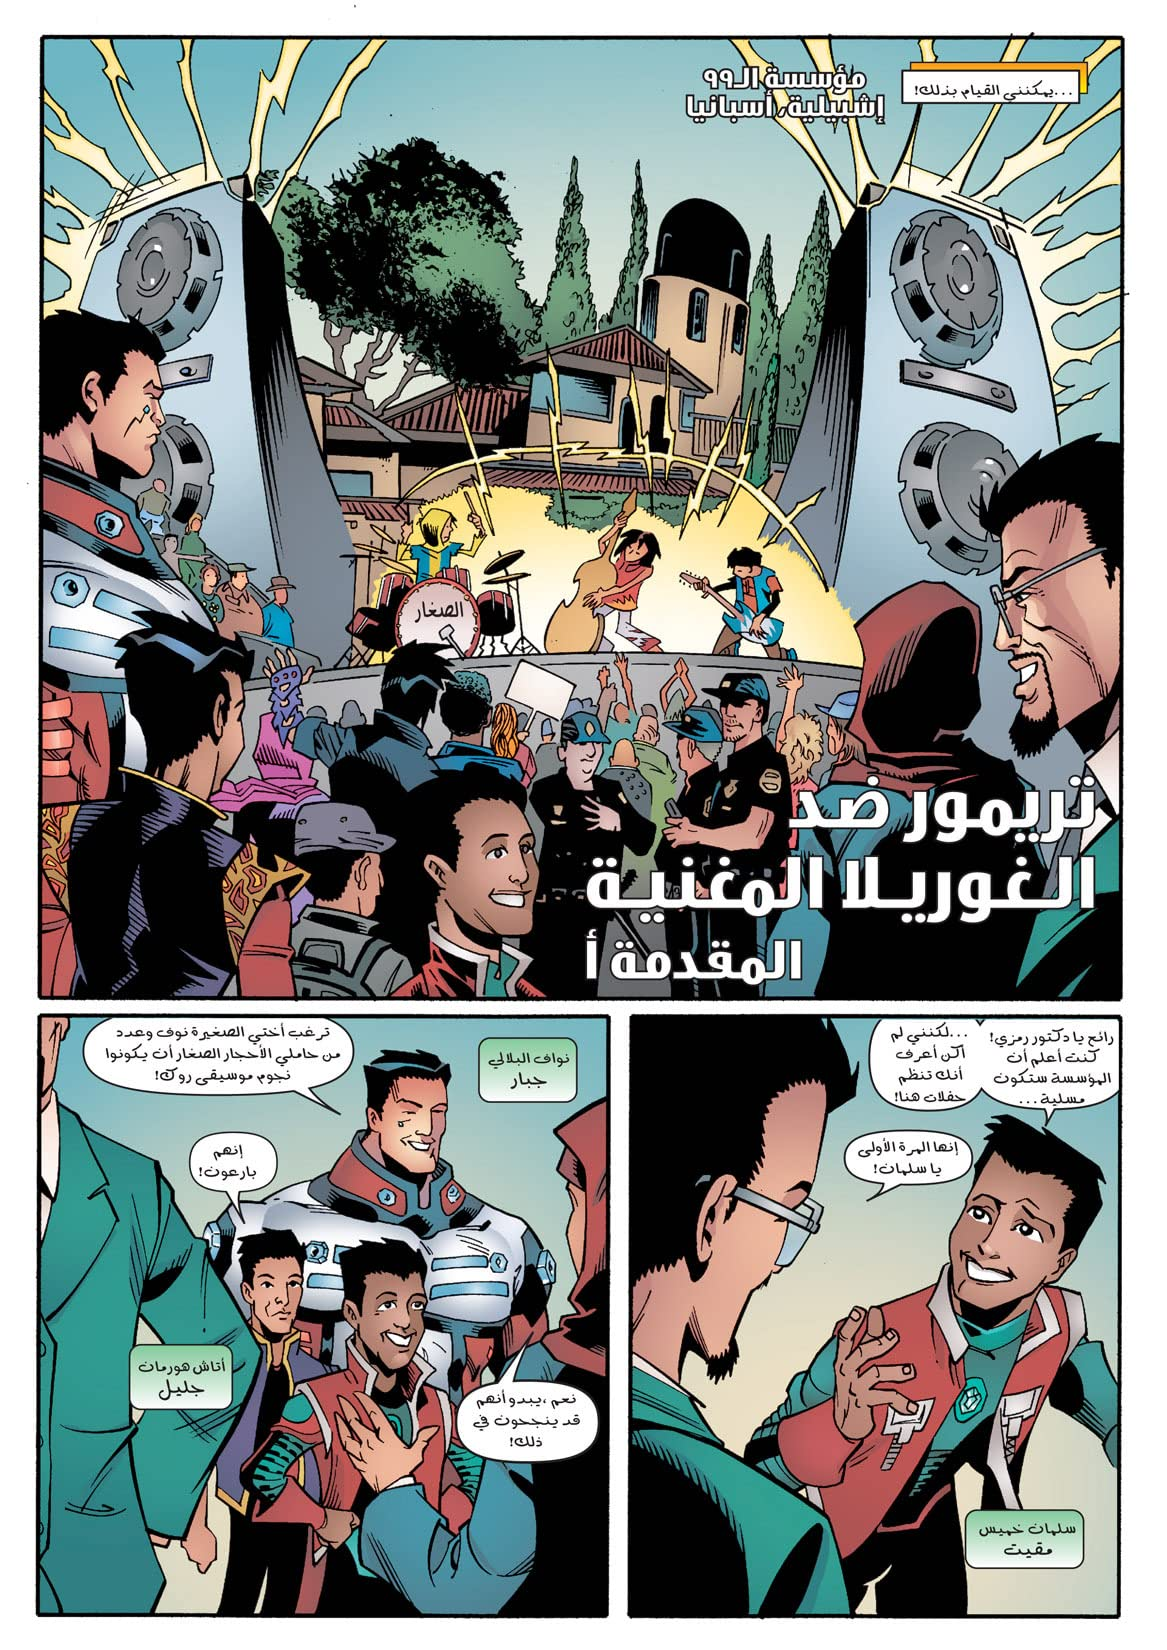 THE 99 #27: Arabic